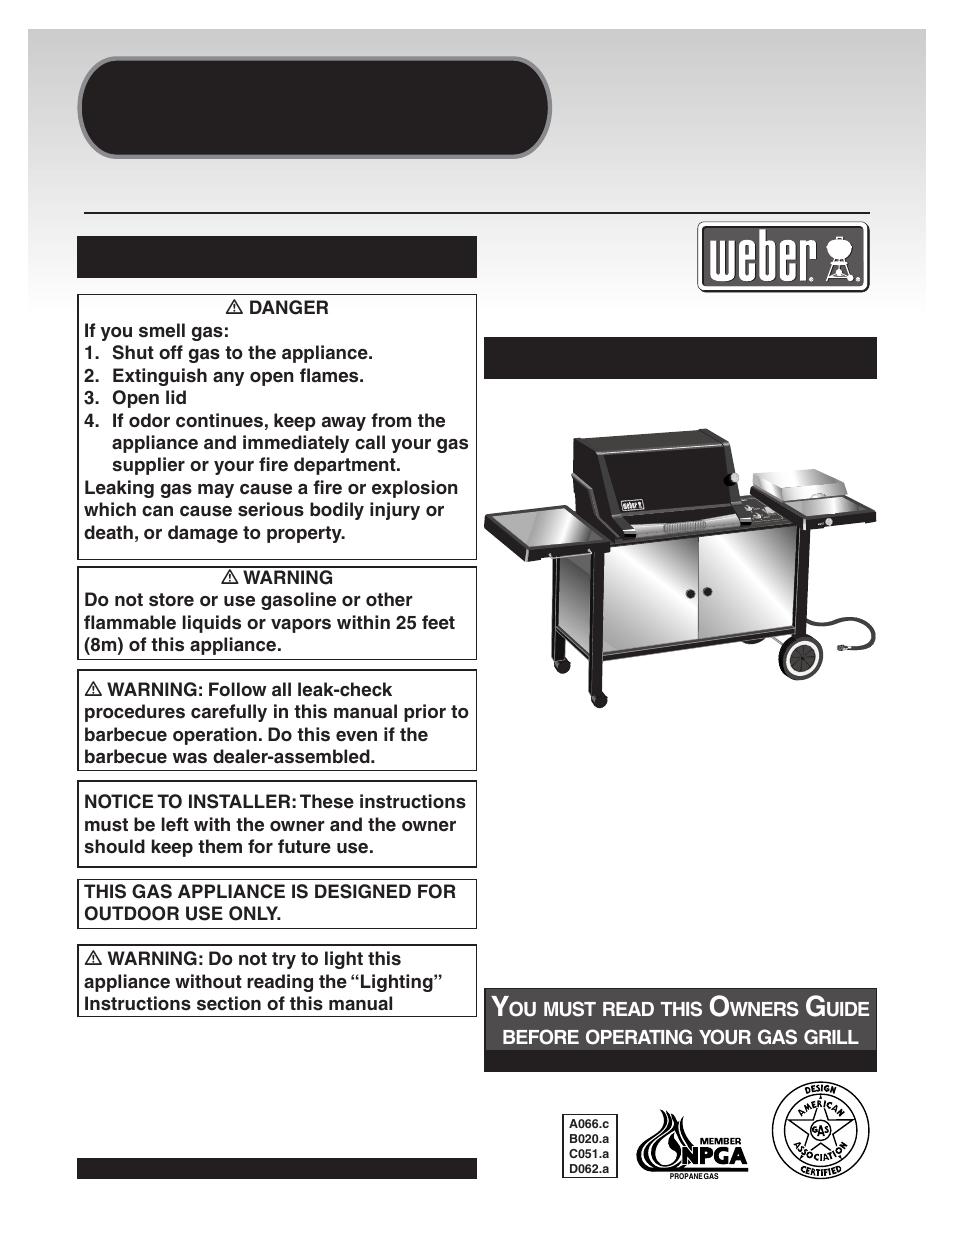 weber gas grill manual basic instruction manual u2022 rh winwithwomen2012 com Weber Q 320 On Sale weber q 320 manual pdf